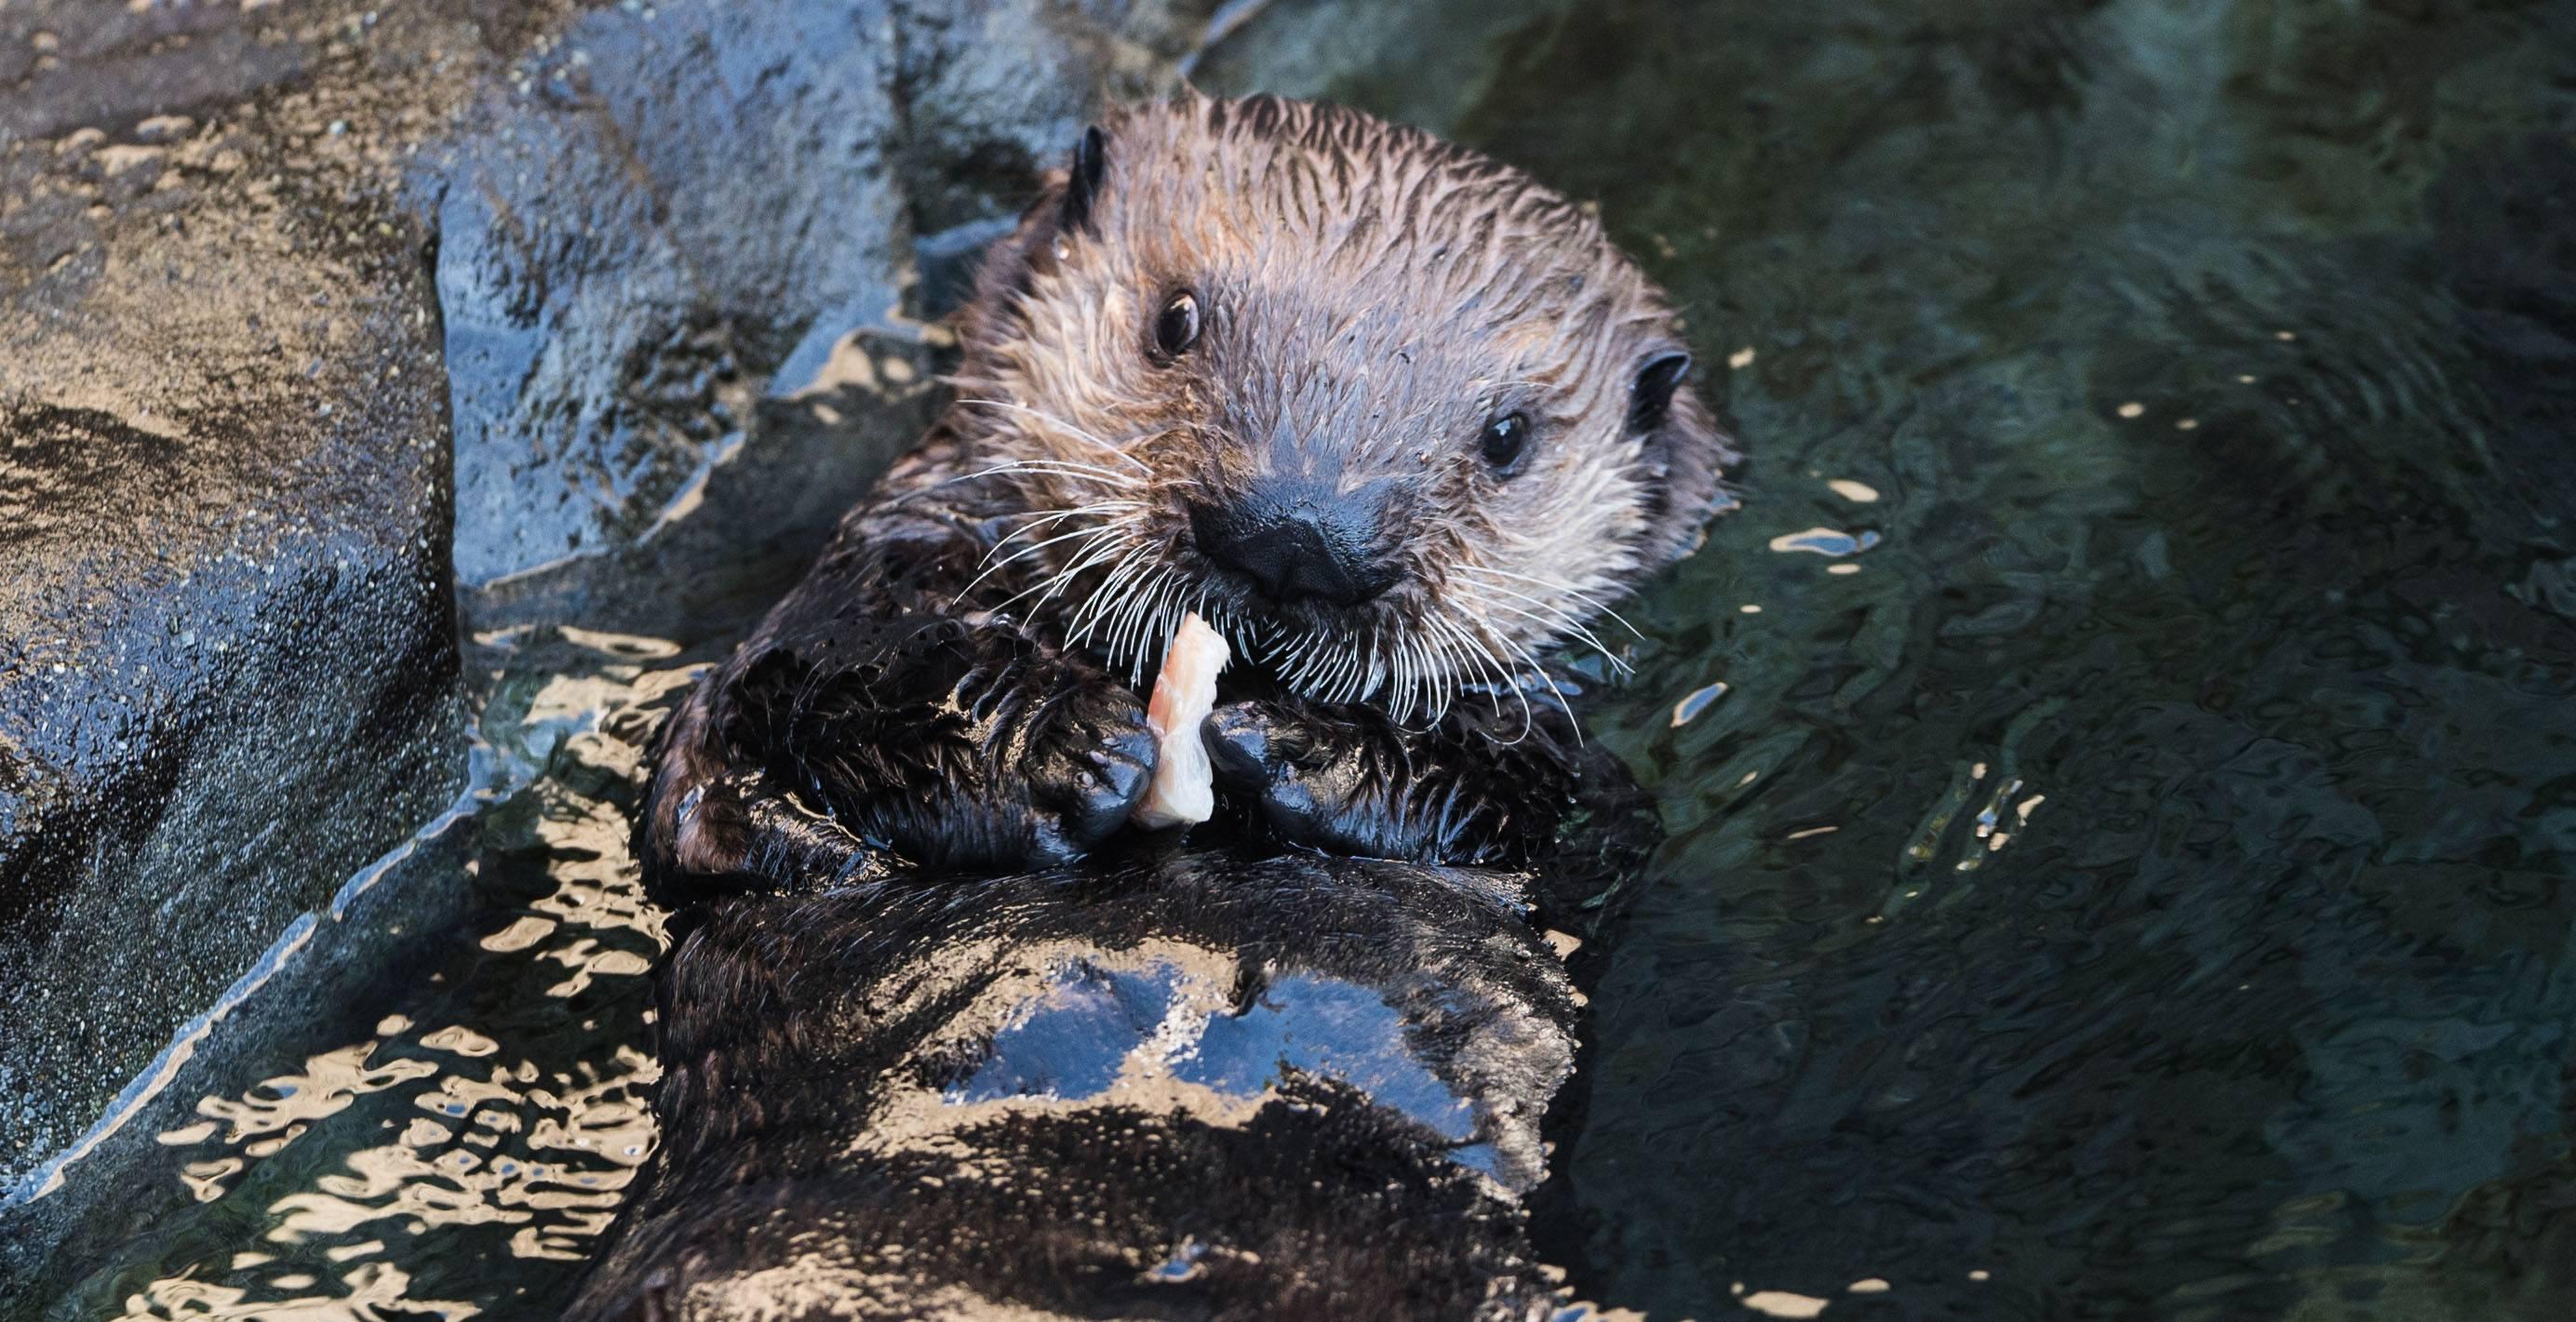 Hardy eating (Vancouver Aquarium)